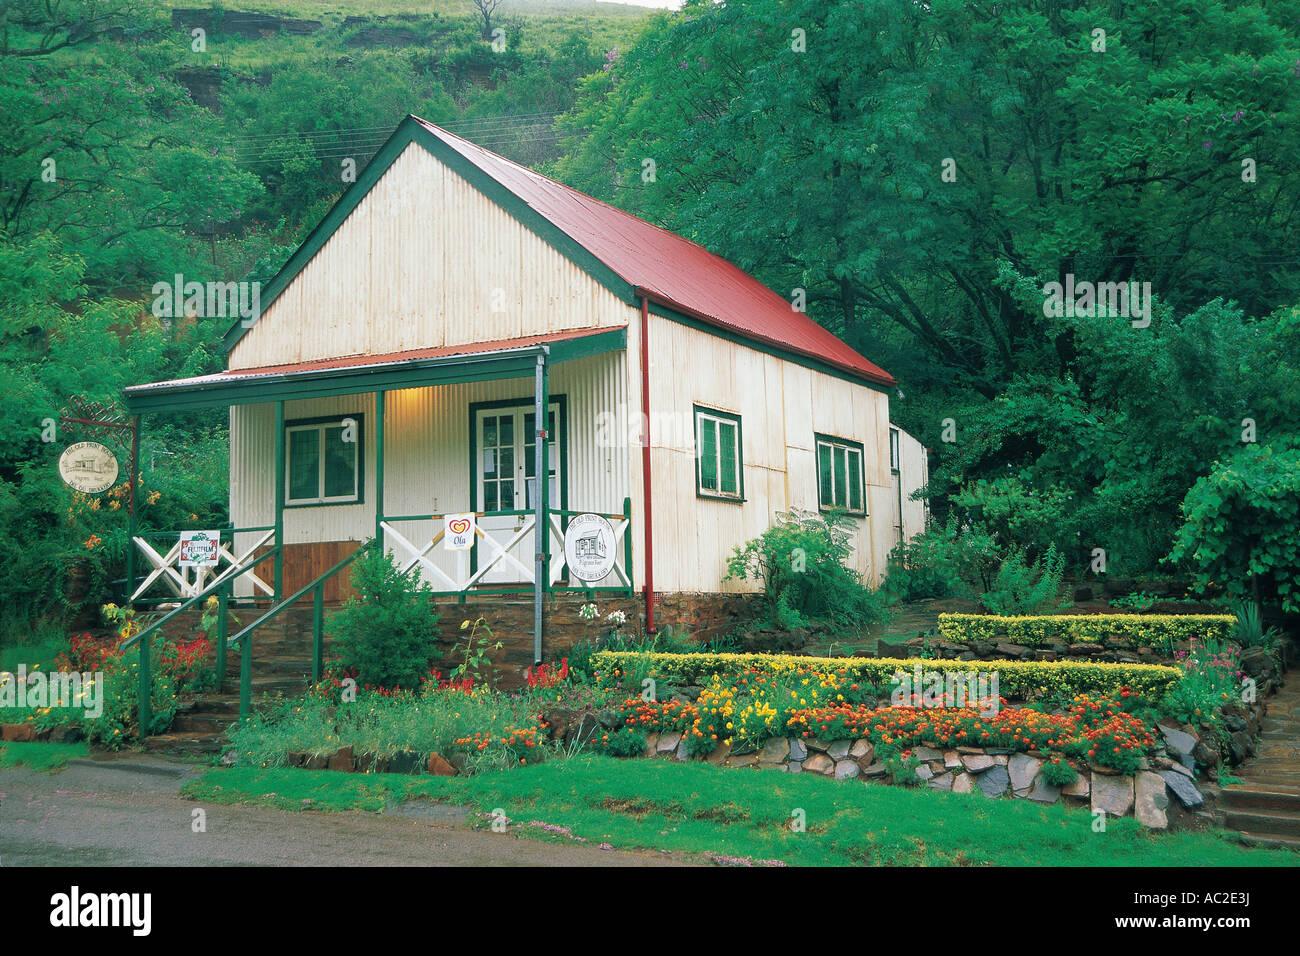 The Old Print House Pilgrim s Rest historic gold mining village Mpumalanga South Africa - Stock Image